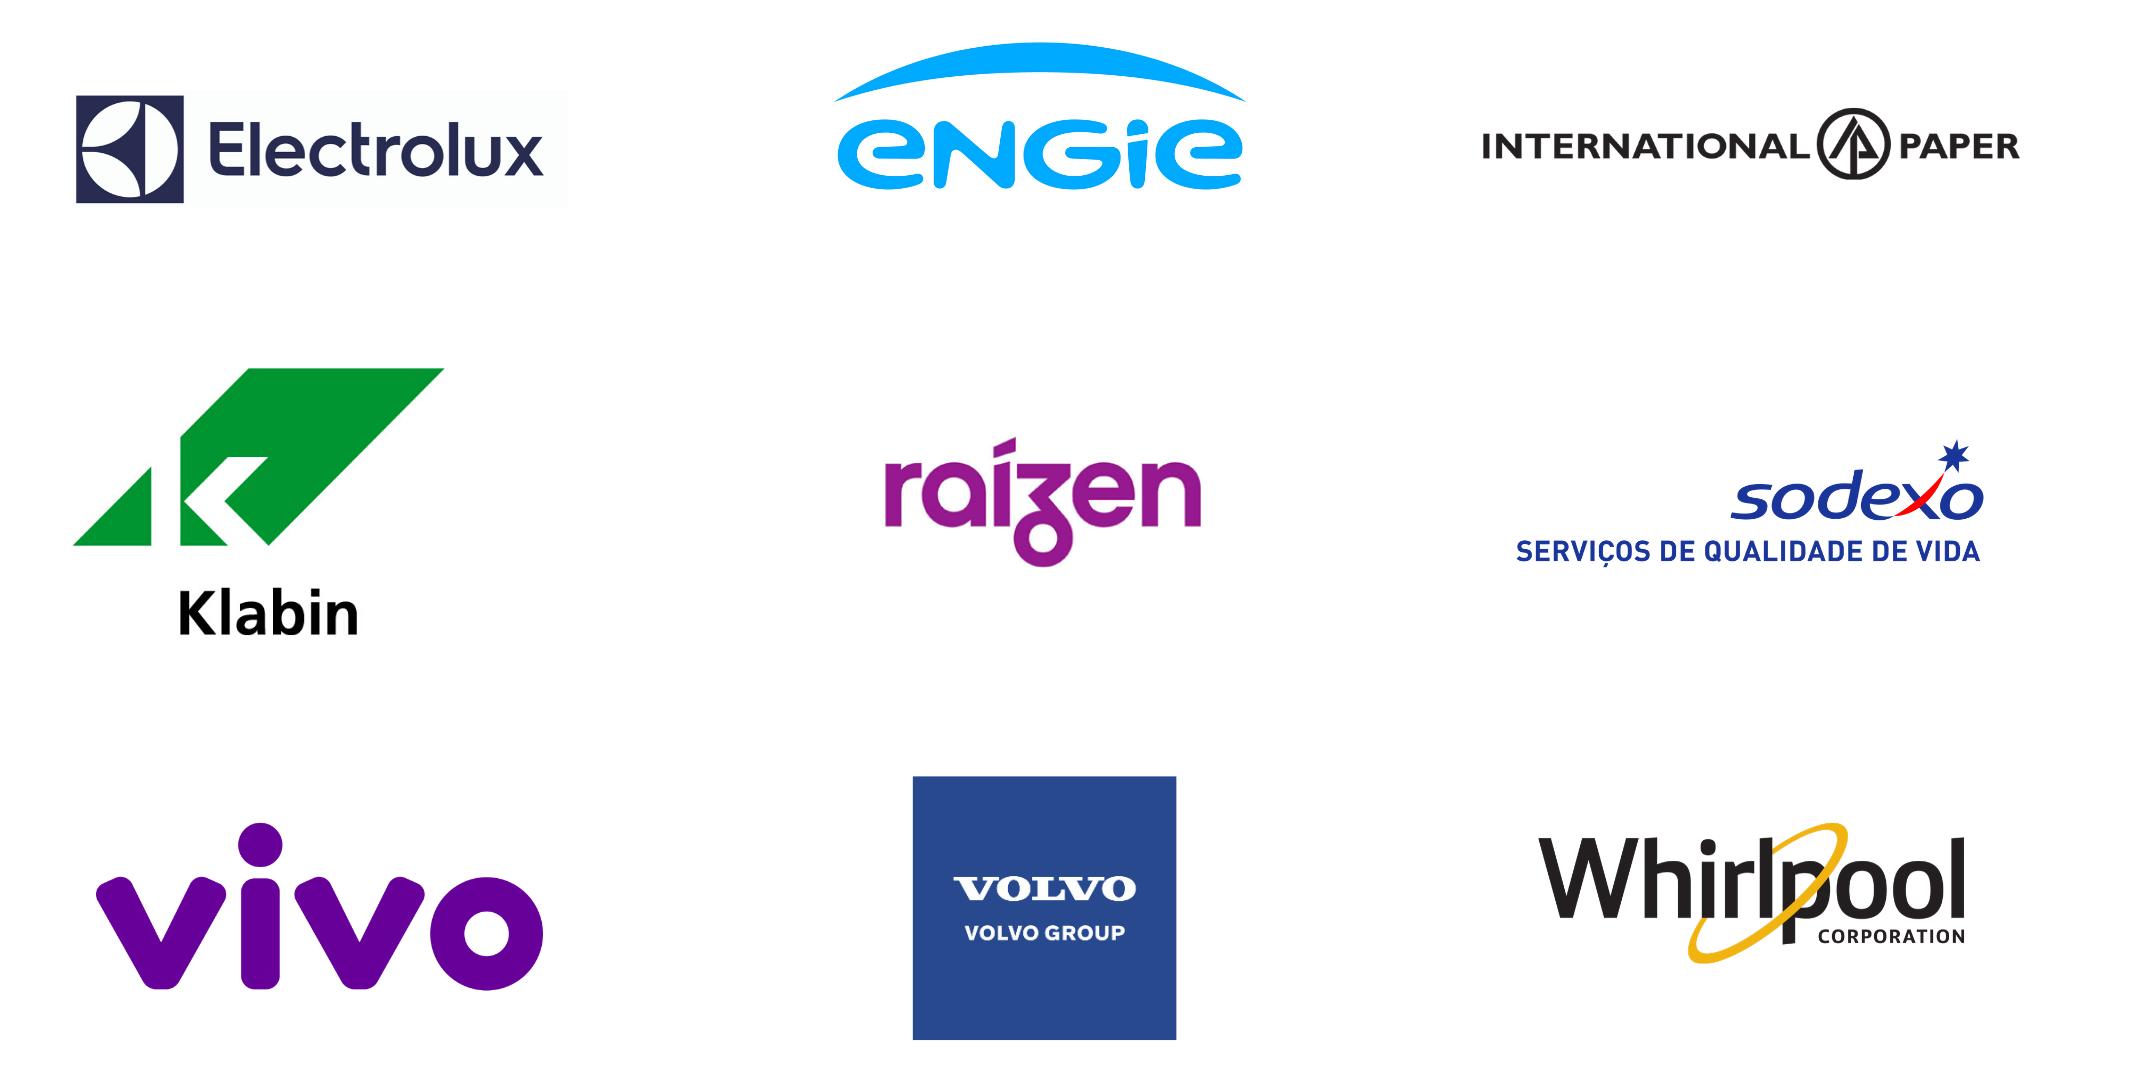 Vivo, Raízen, International Paper, Engie, Volvo Group, Klabin, Whirlpool e Electrolux